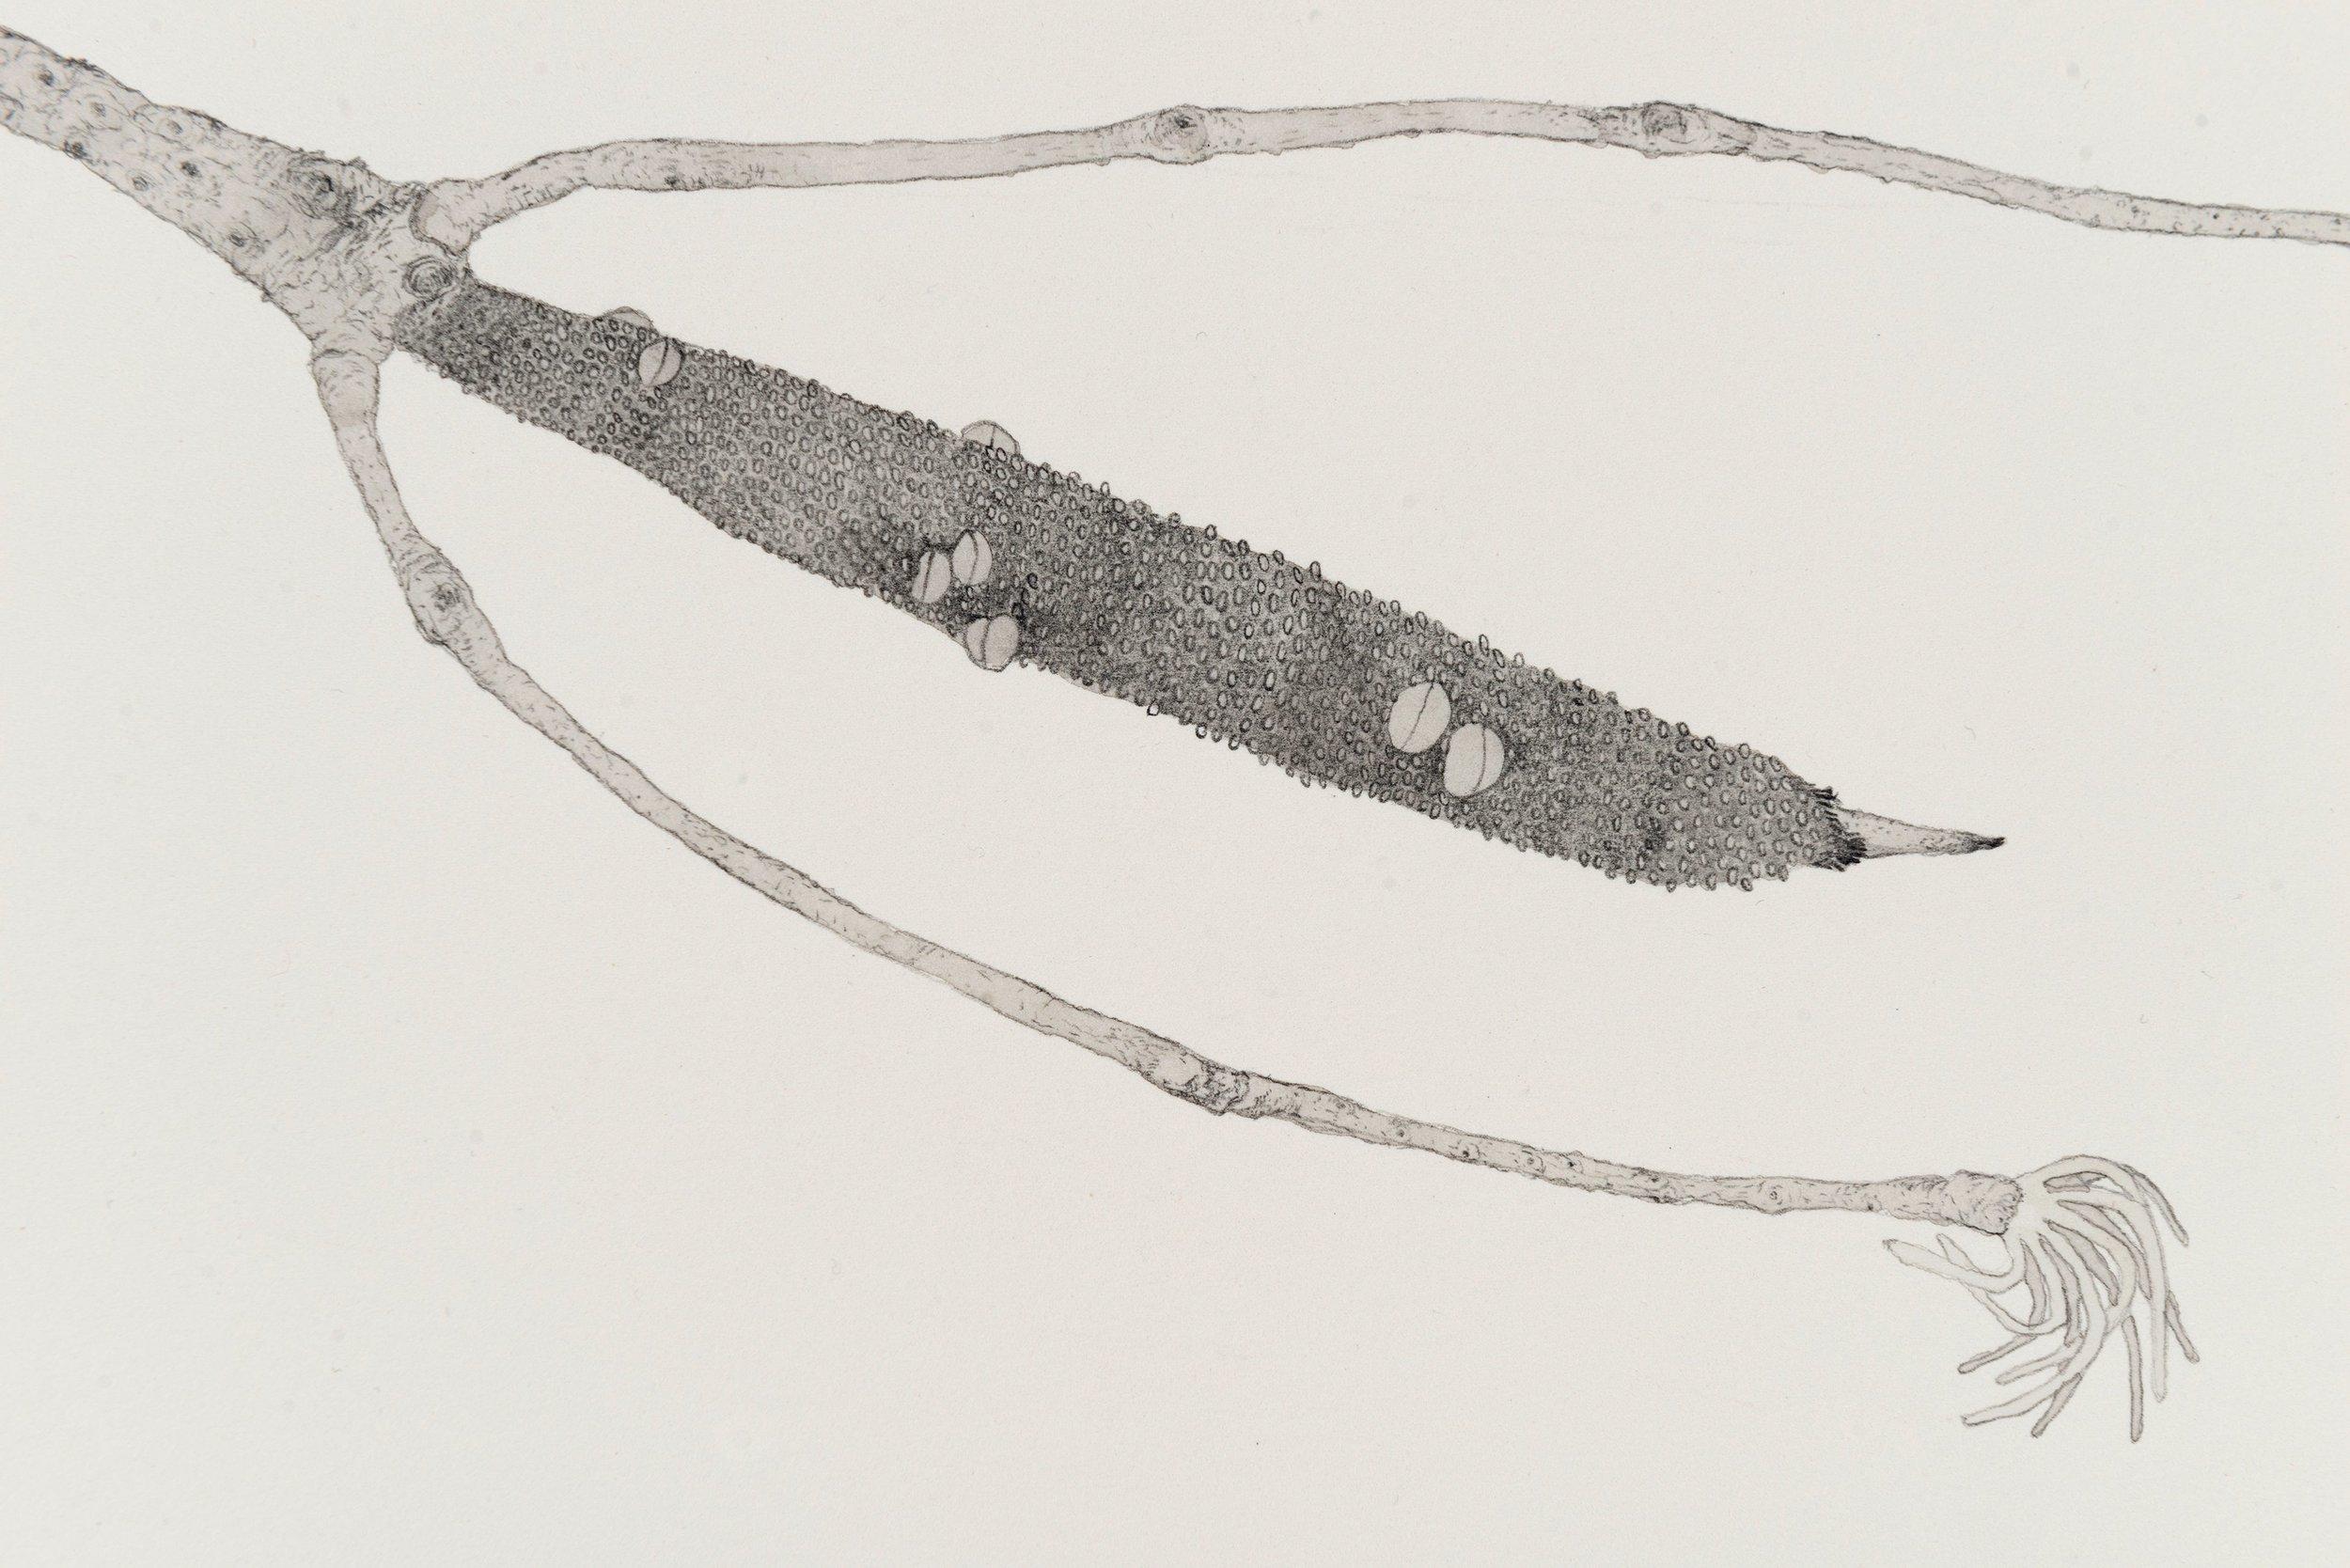 Filum (Detail), 2017, ink, graphite and pencil on paper, 57 x 76cm. Photographer: Eva Fernandez